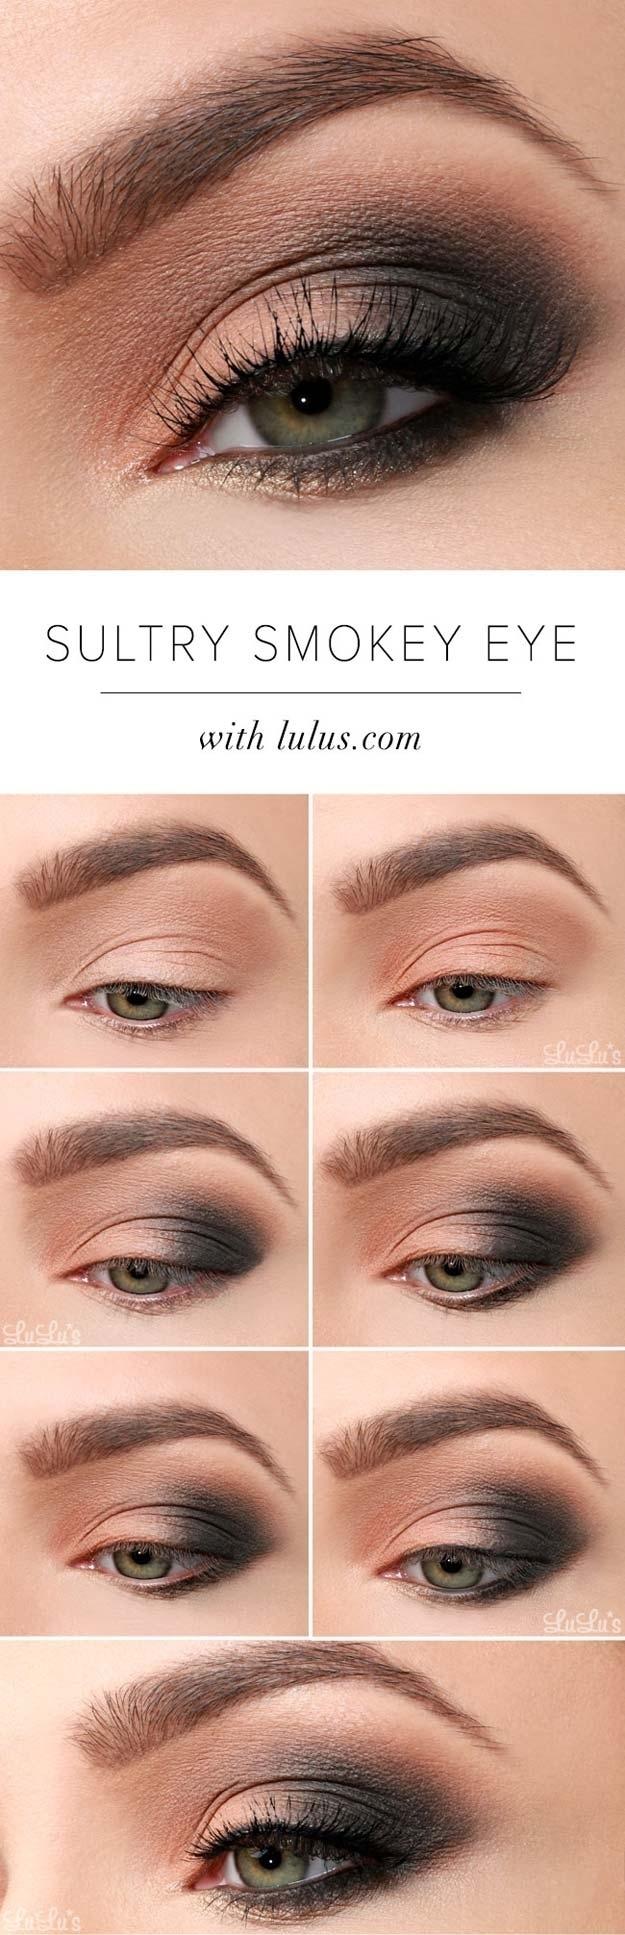 easy makeup looks for hazel eyes - wavy haircut